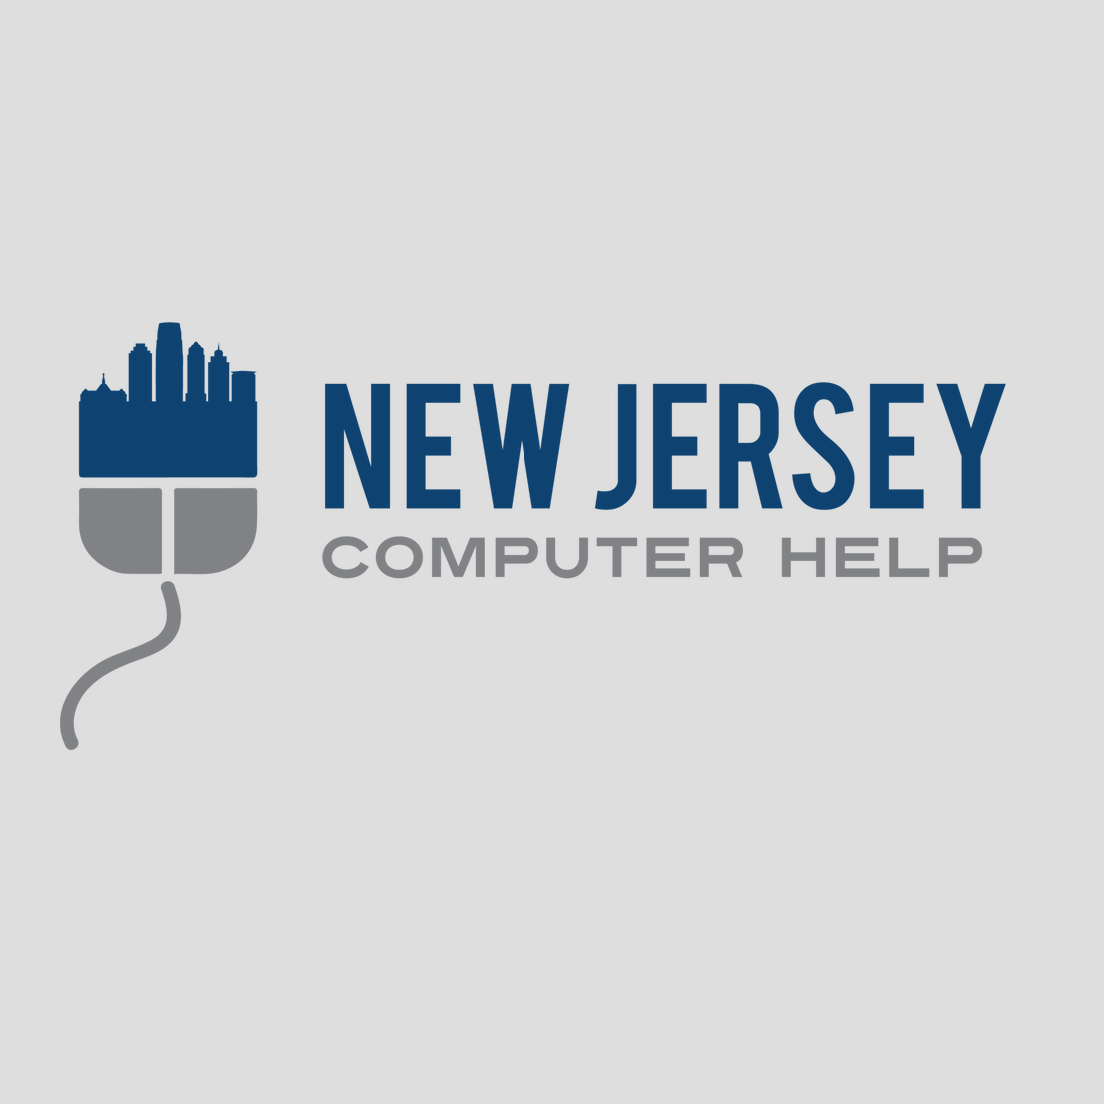 New Jersey Computer Help